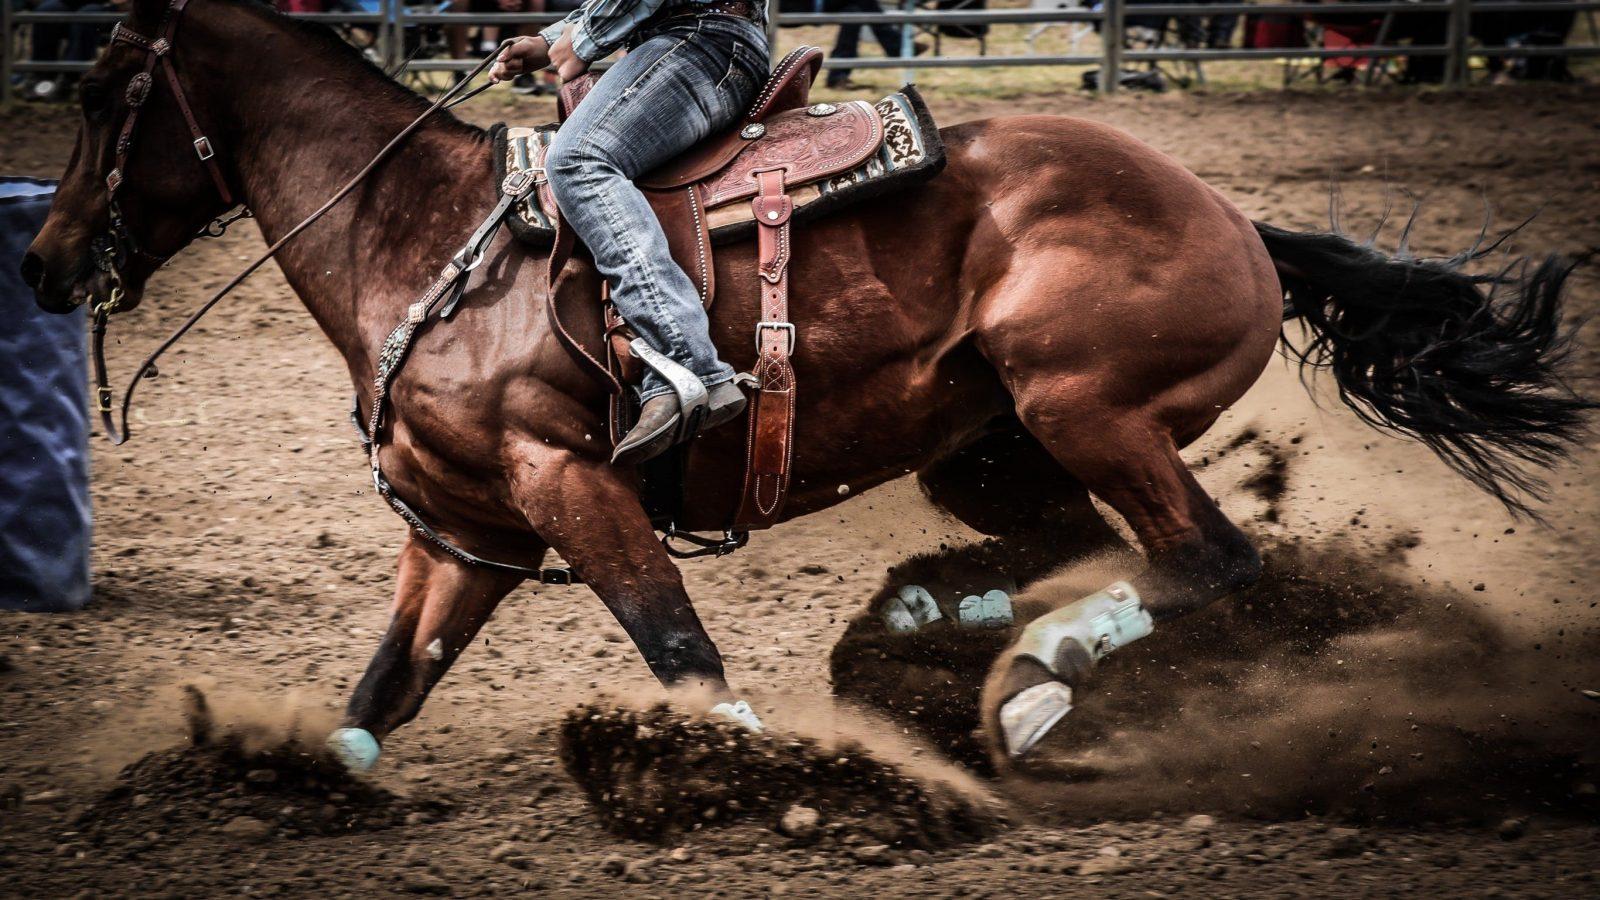 Wagga Pro Rodeo